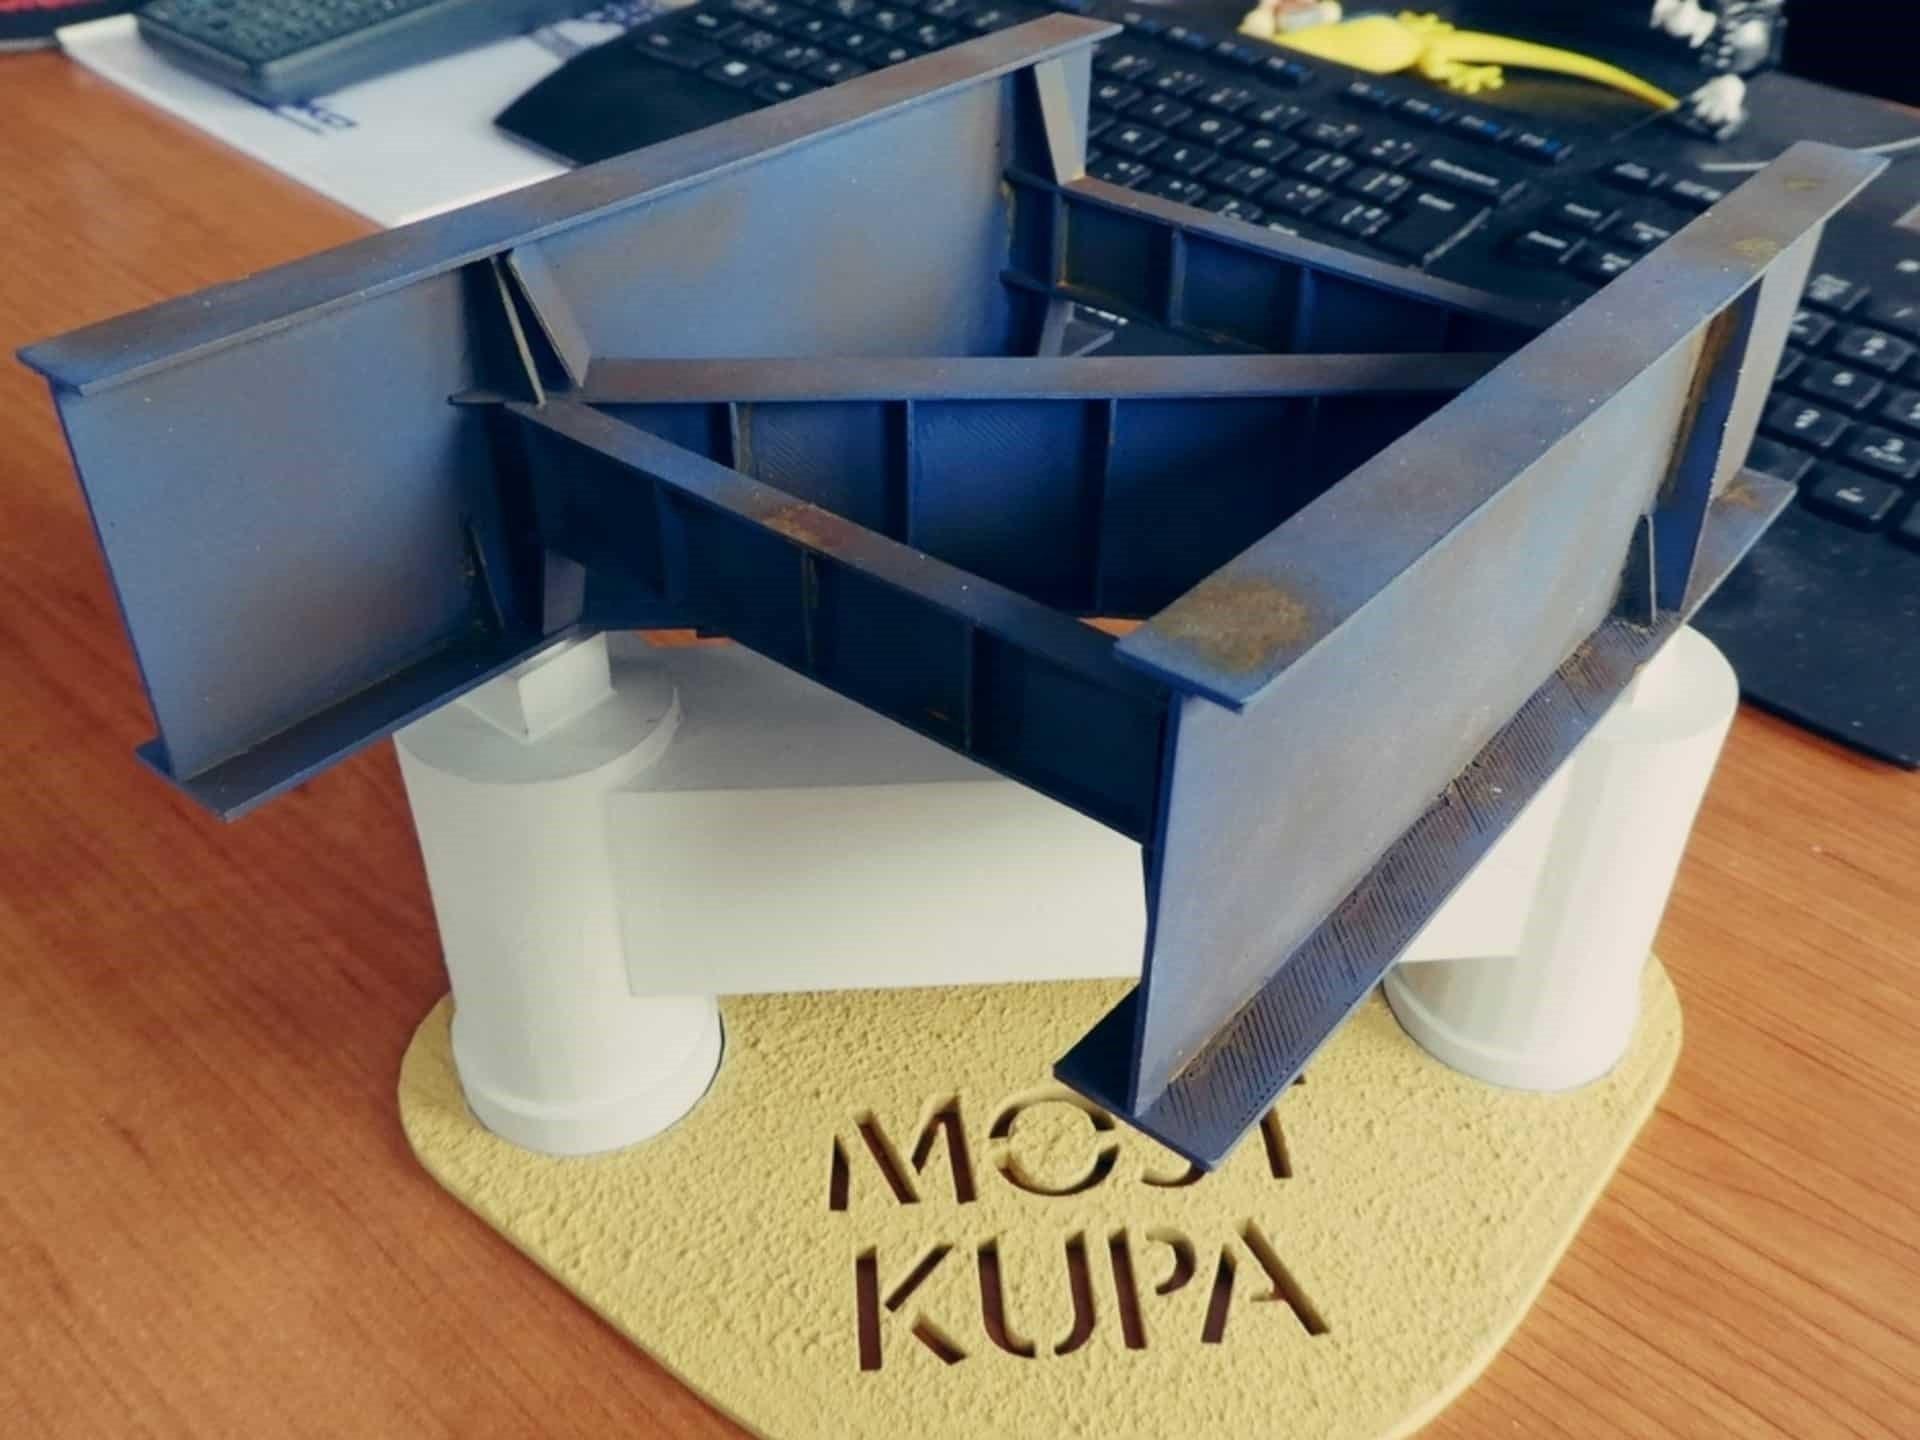 Most Kupa-3D print